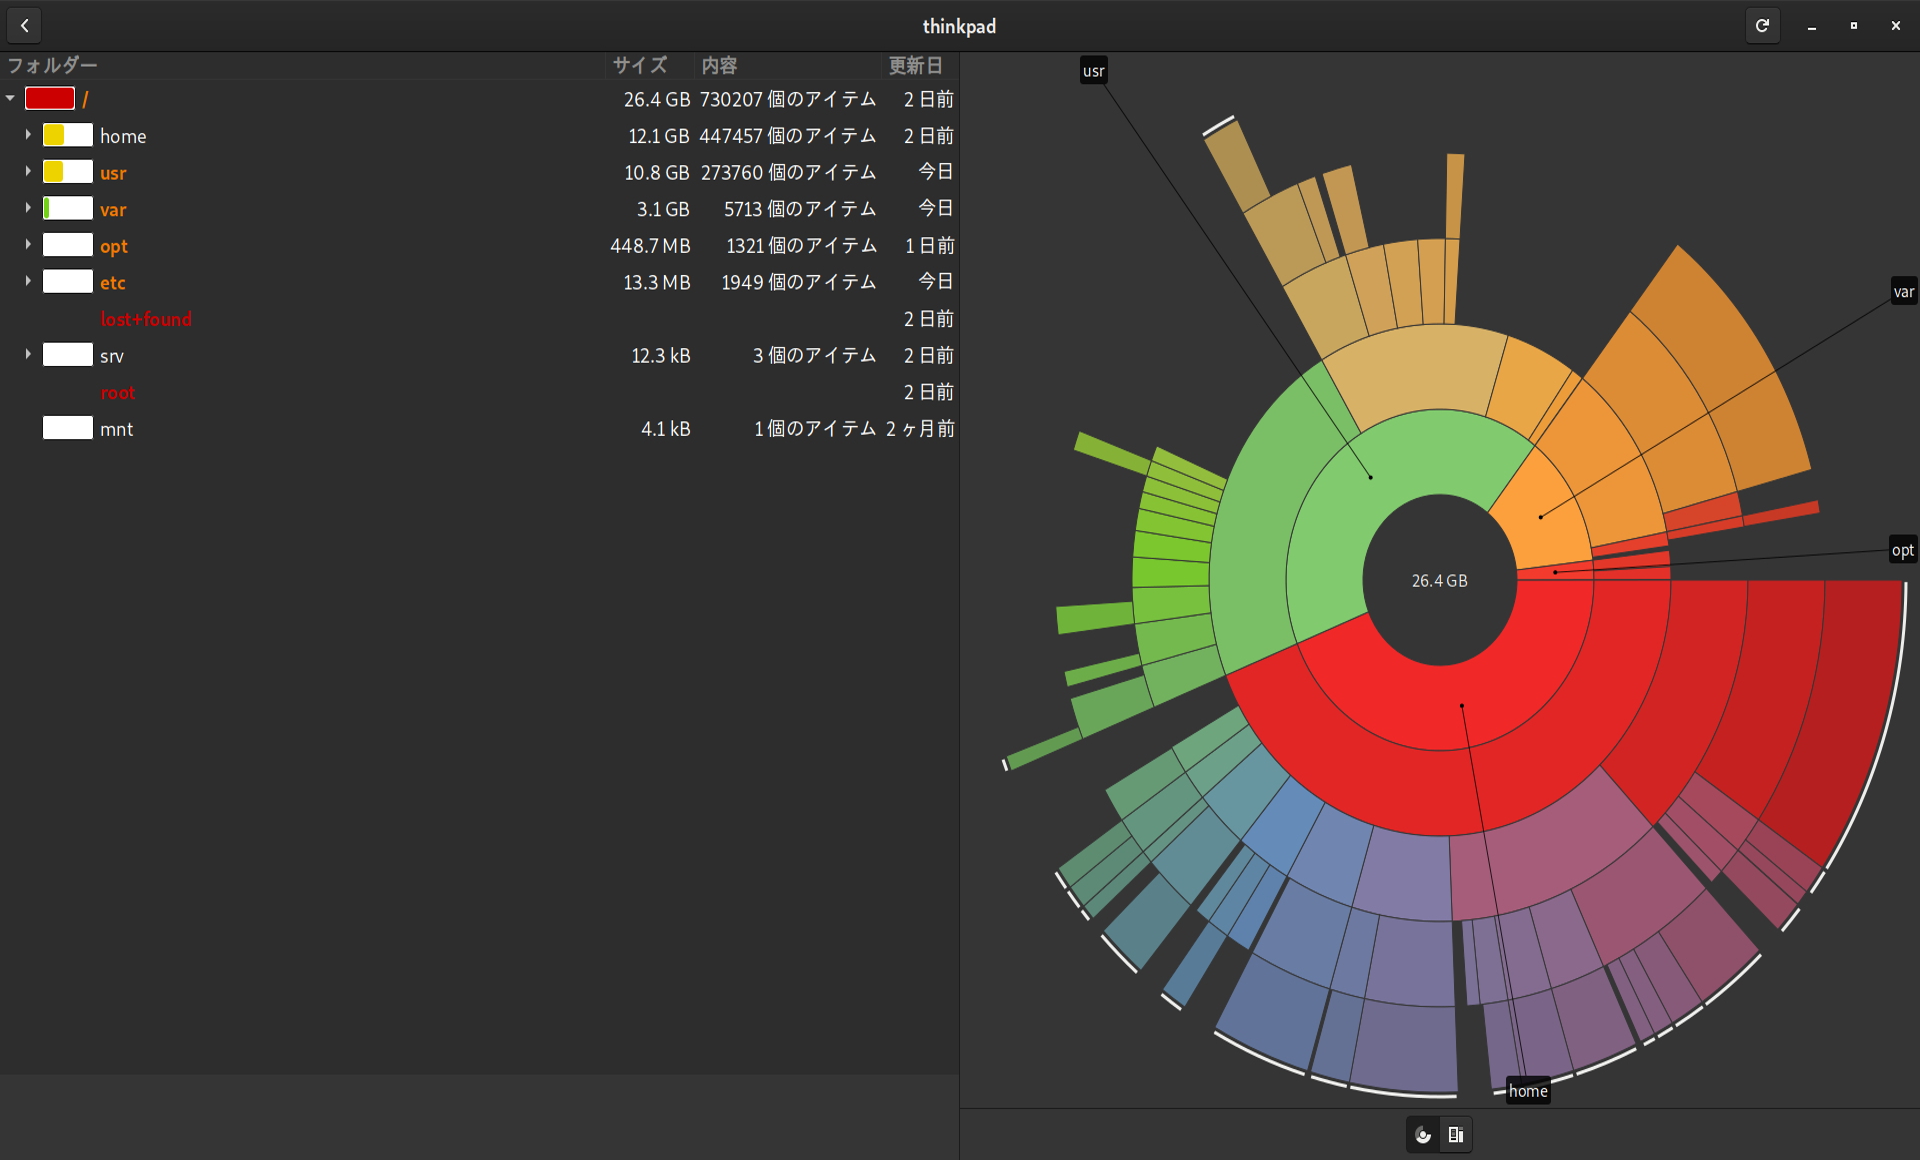 GitHub - masasam/dotfiles: My dotfiles based on Makefile